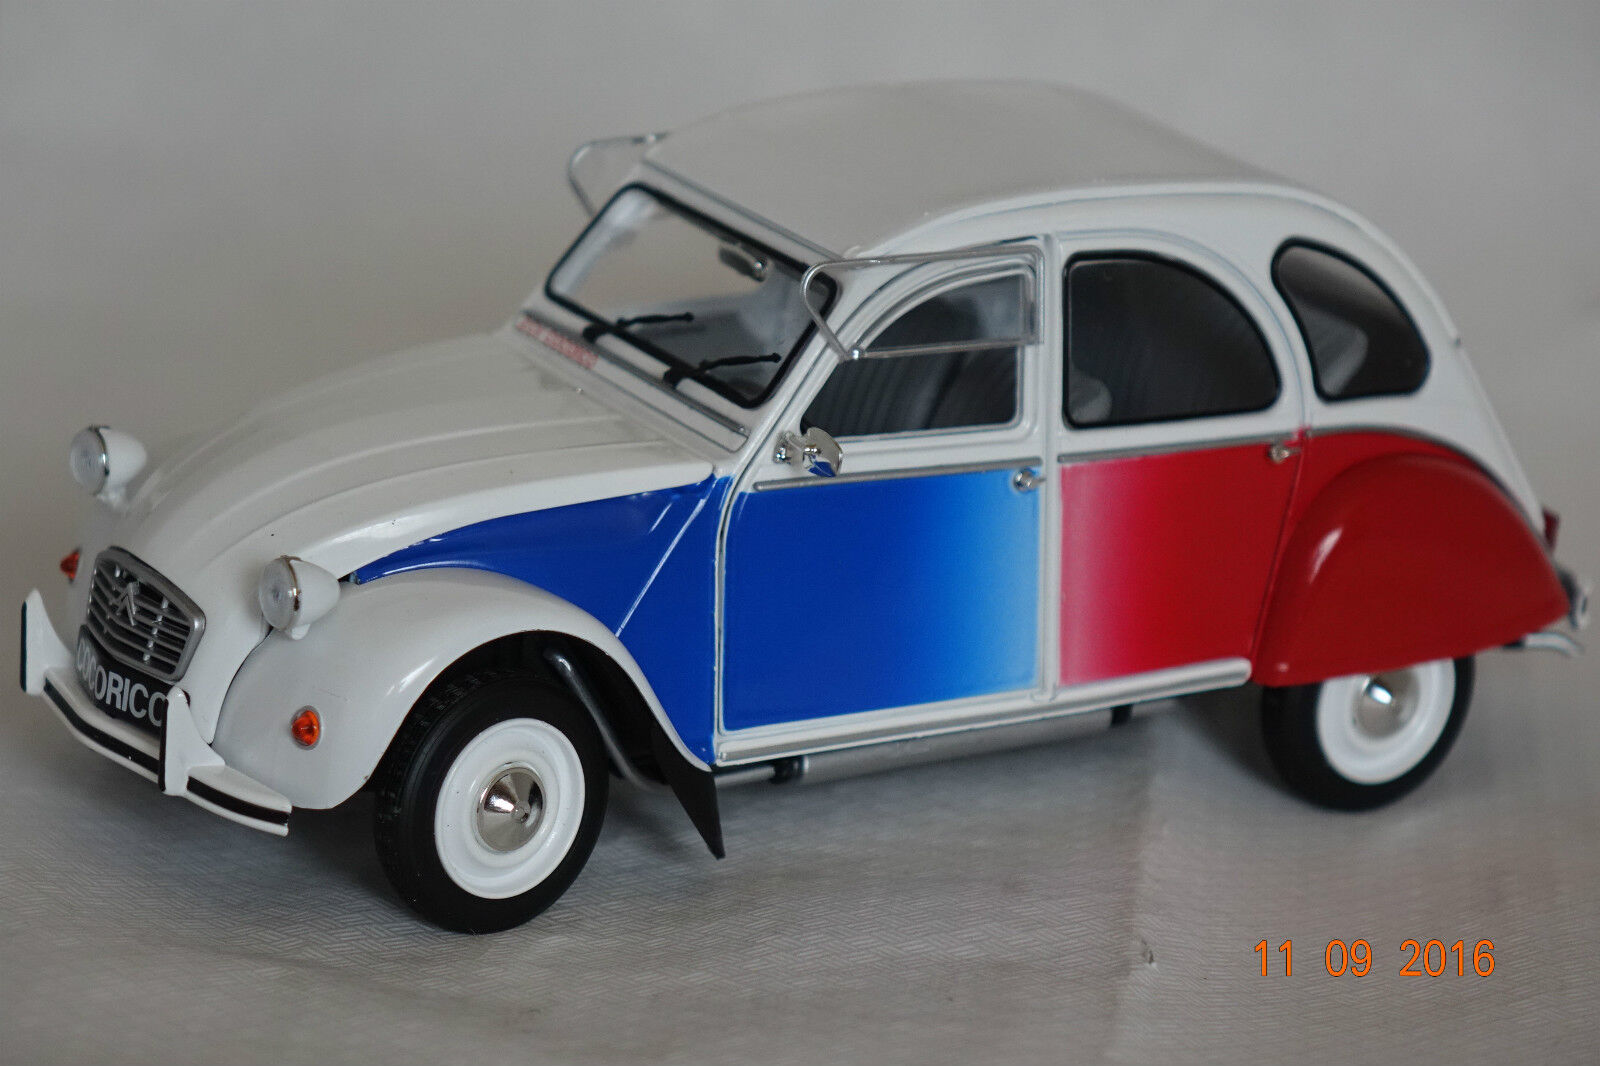 Citroen 2CV 6 Cocorico white-blue-red white-blue-red white-blue-red 1 18 Solido neu + OVP 1850004 a1b7a8